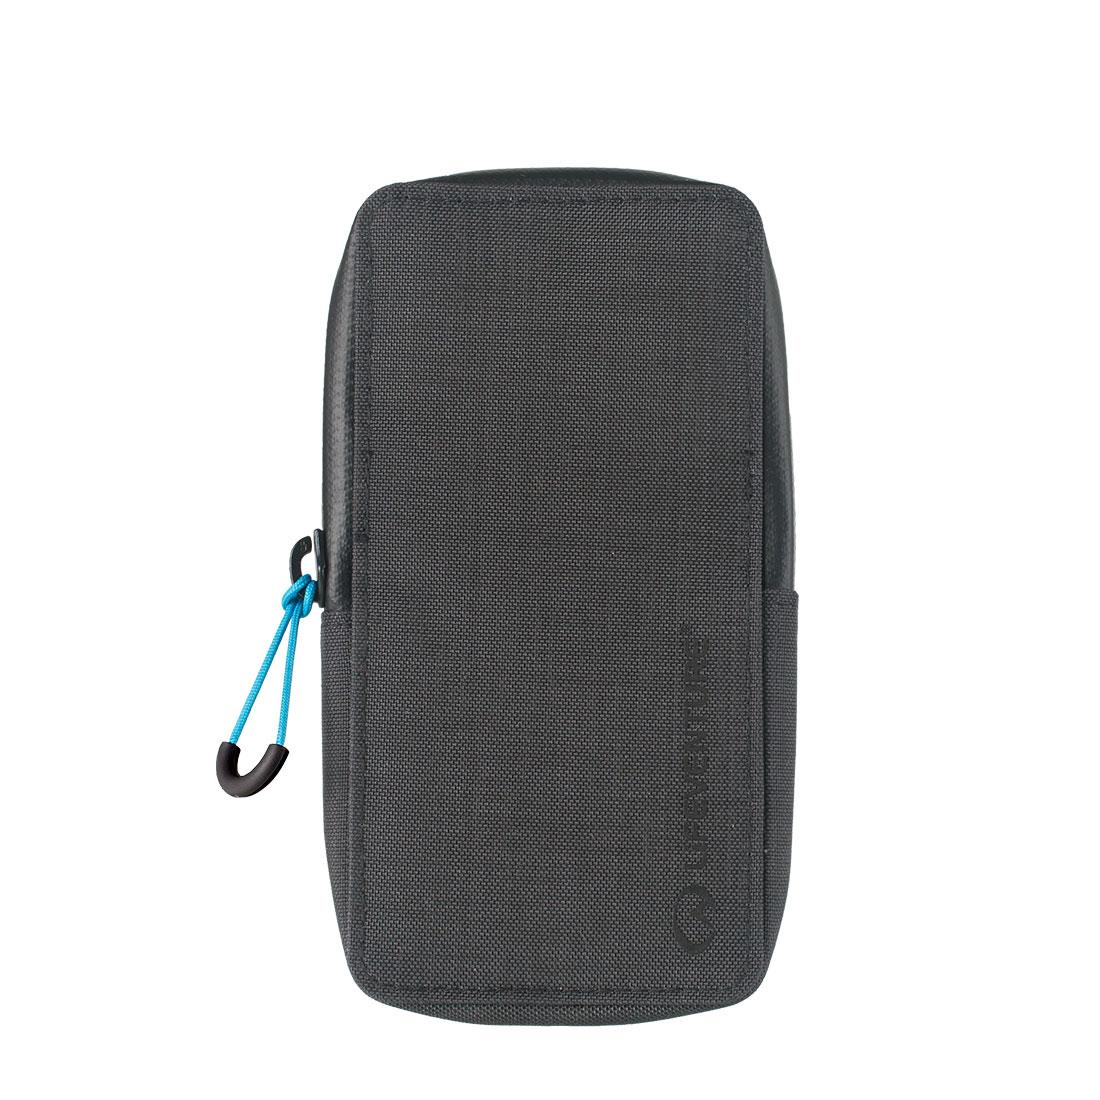 Lifeventure pouzdro na telefon Phone Wallet Barva: černá